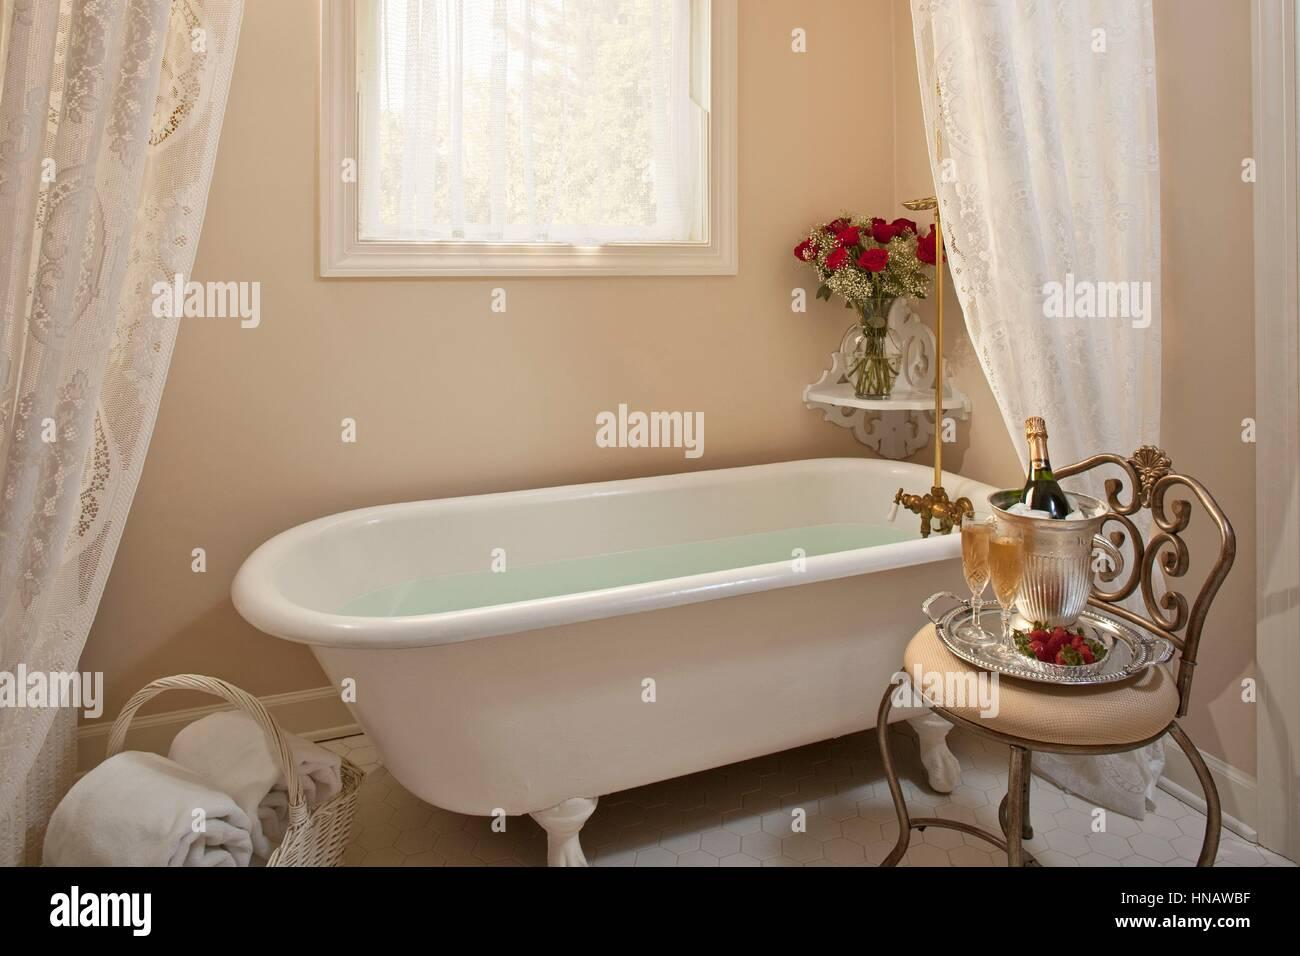 Claw foot tub in Mississippi inn bathroom, Fairview Inn, Jackson, MS. - Stock Image